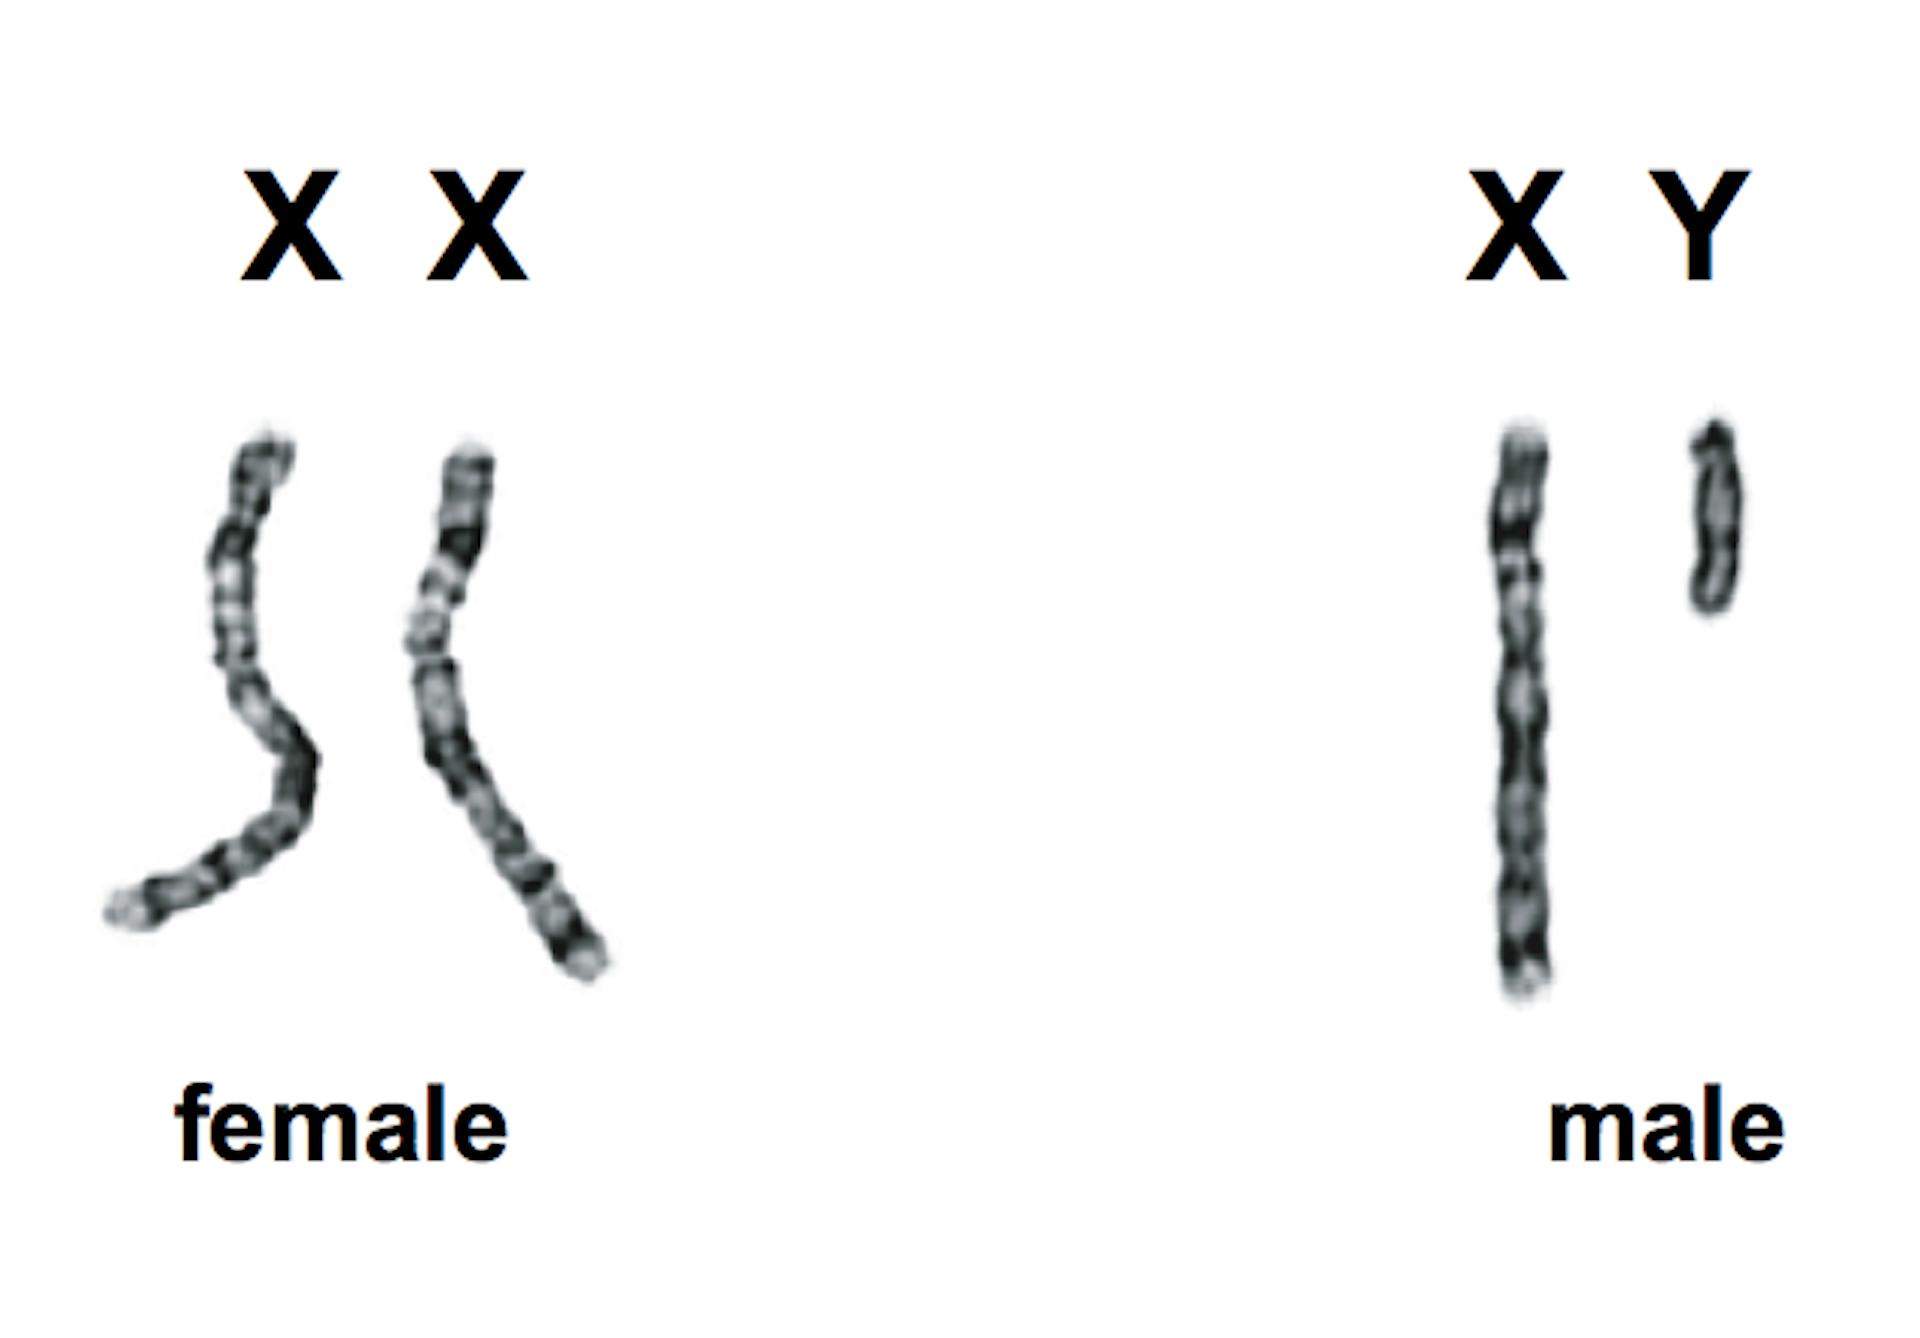 Sex cromosomes